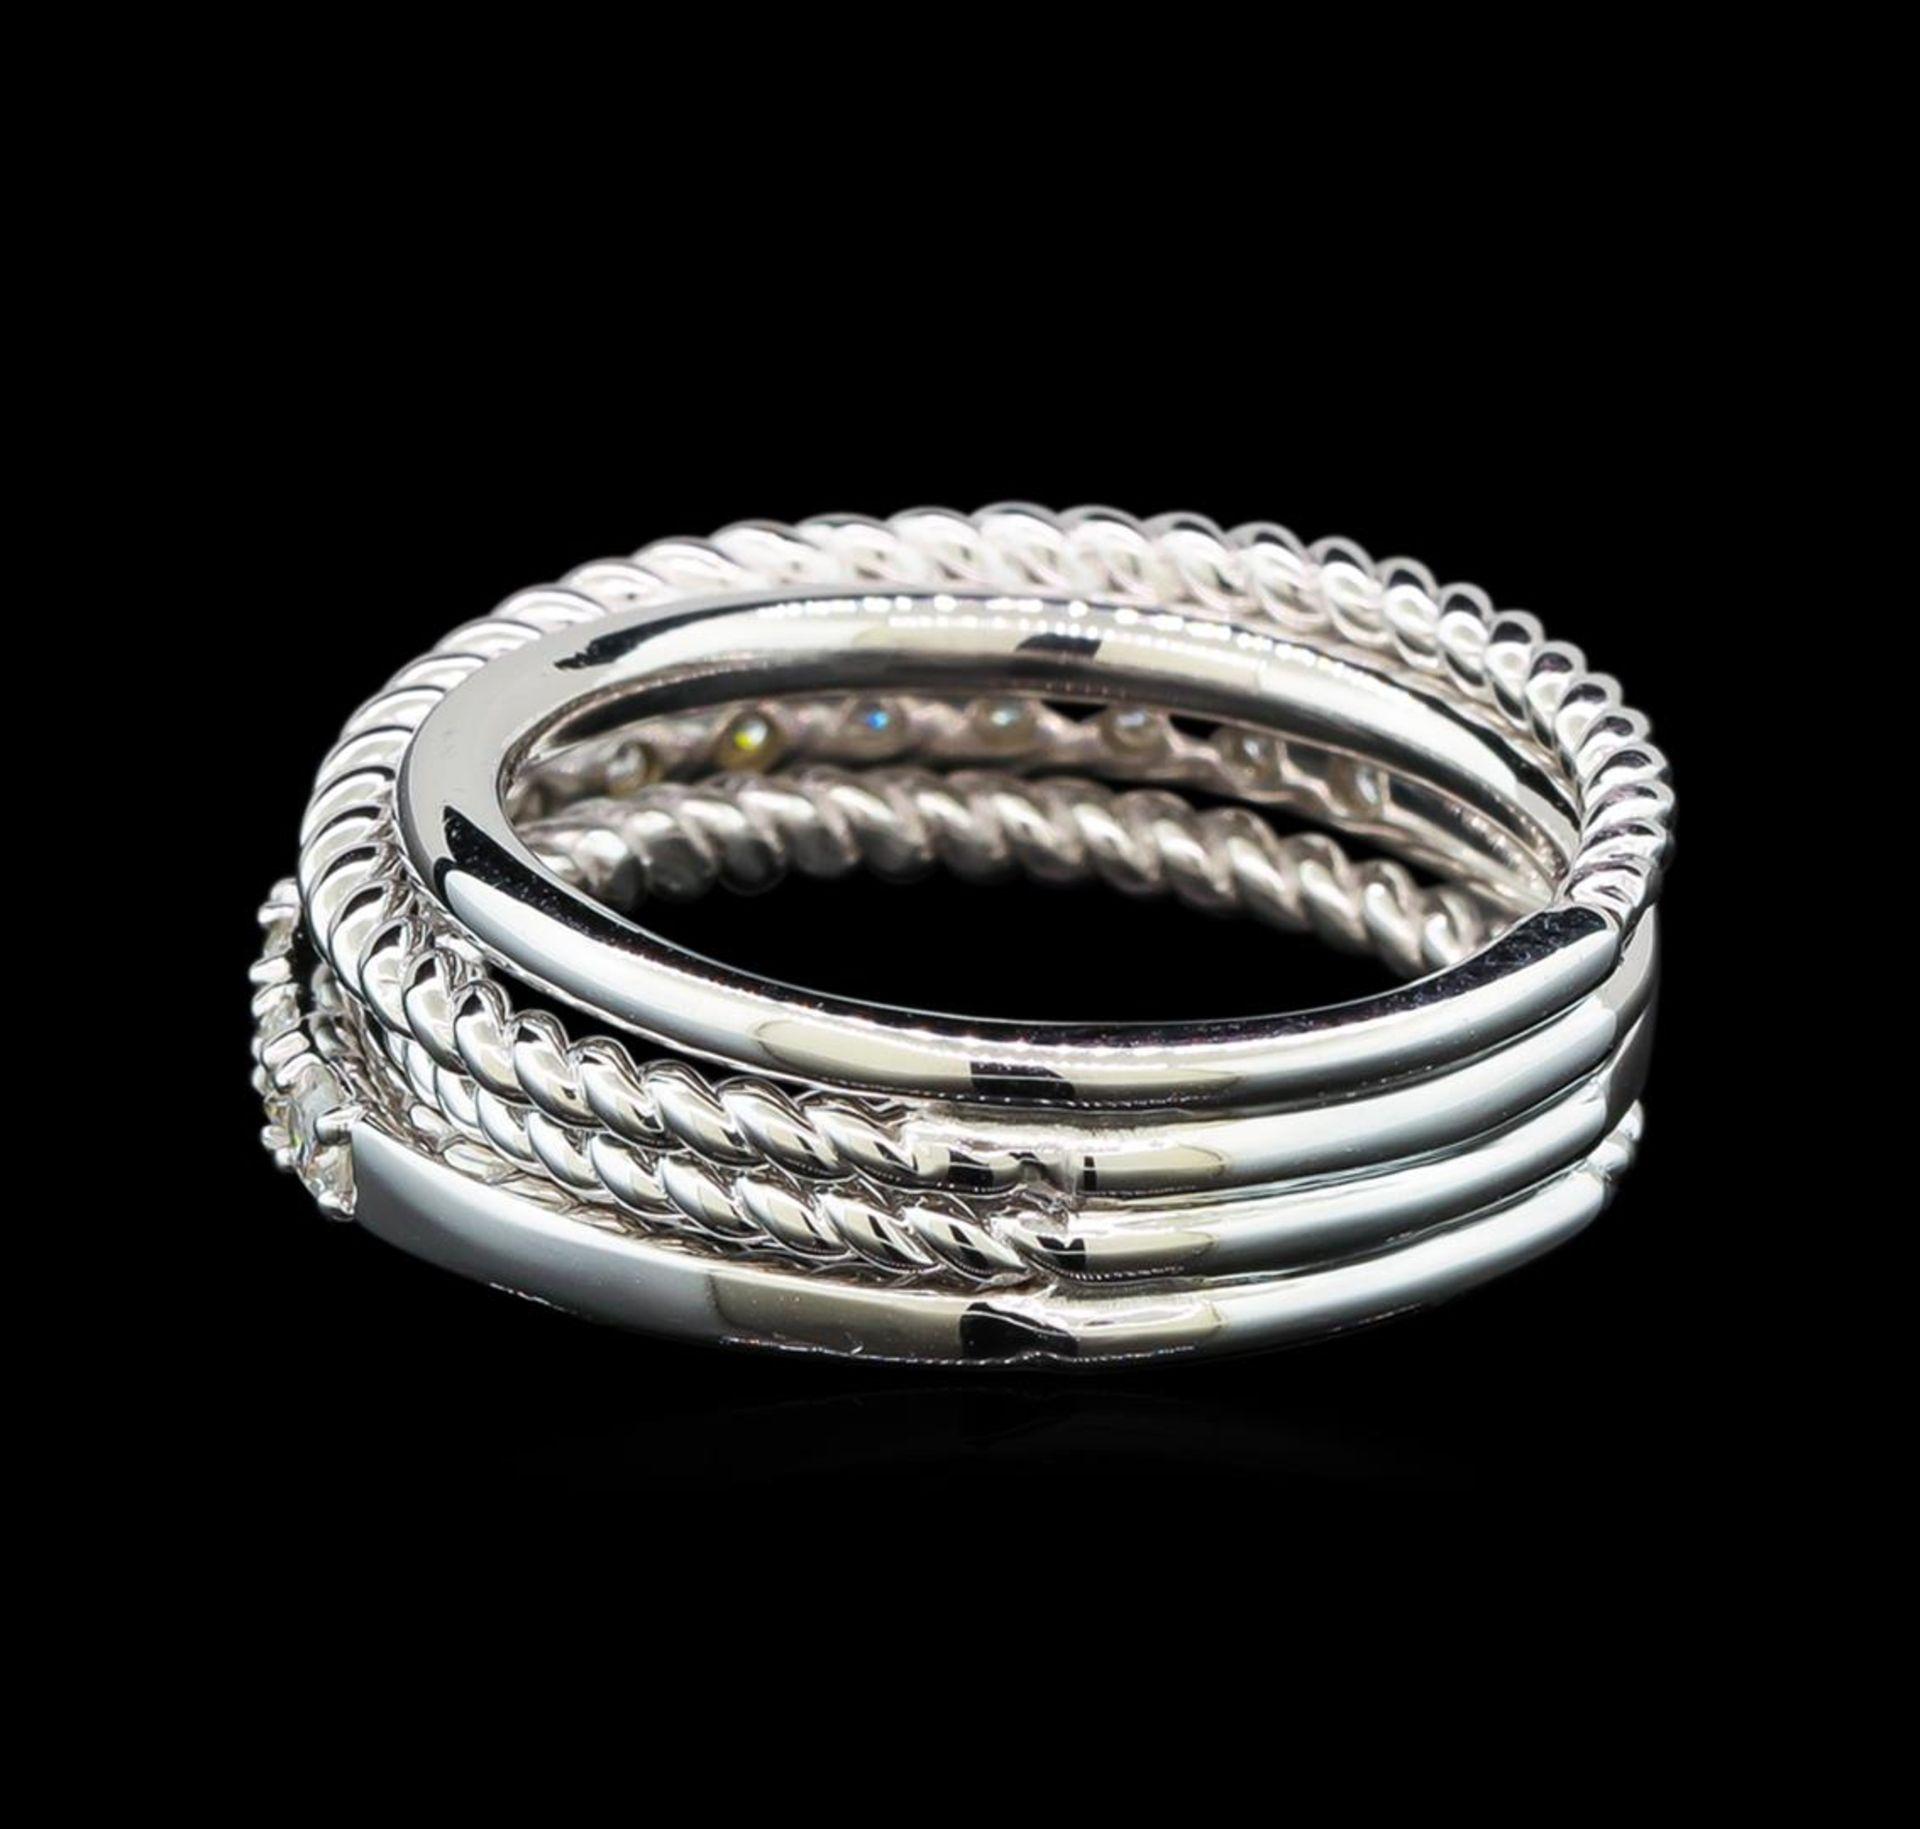 0.65 ctw Diamond Ring - 14KT White Gold - Image 2 of 3